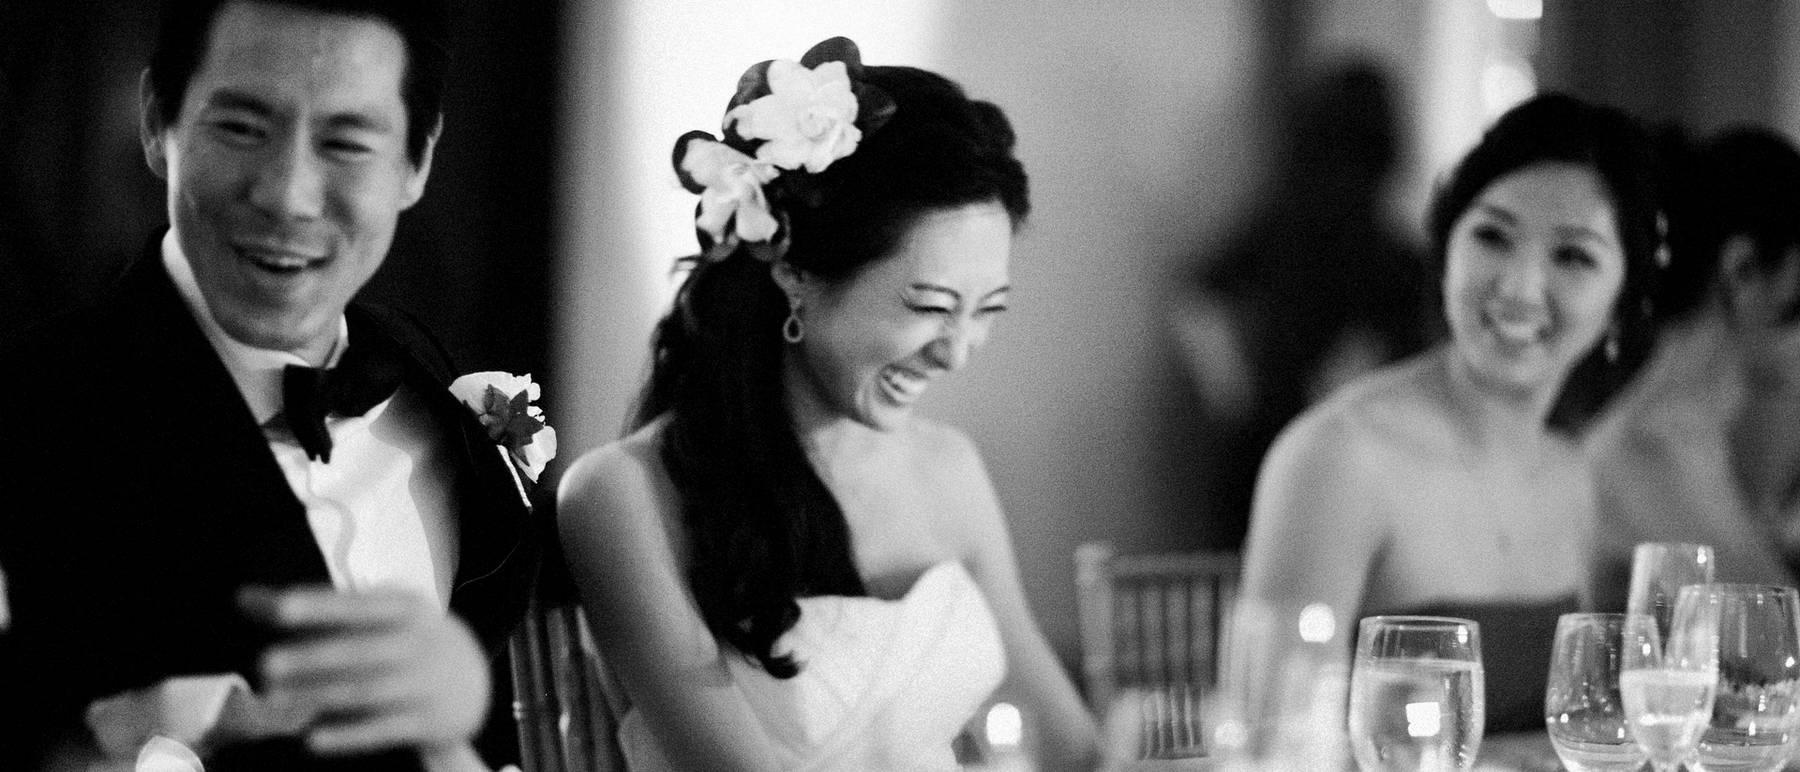 johnandjoseph-wedding-photographer-hz-slider-141